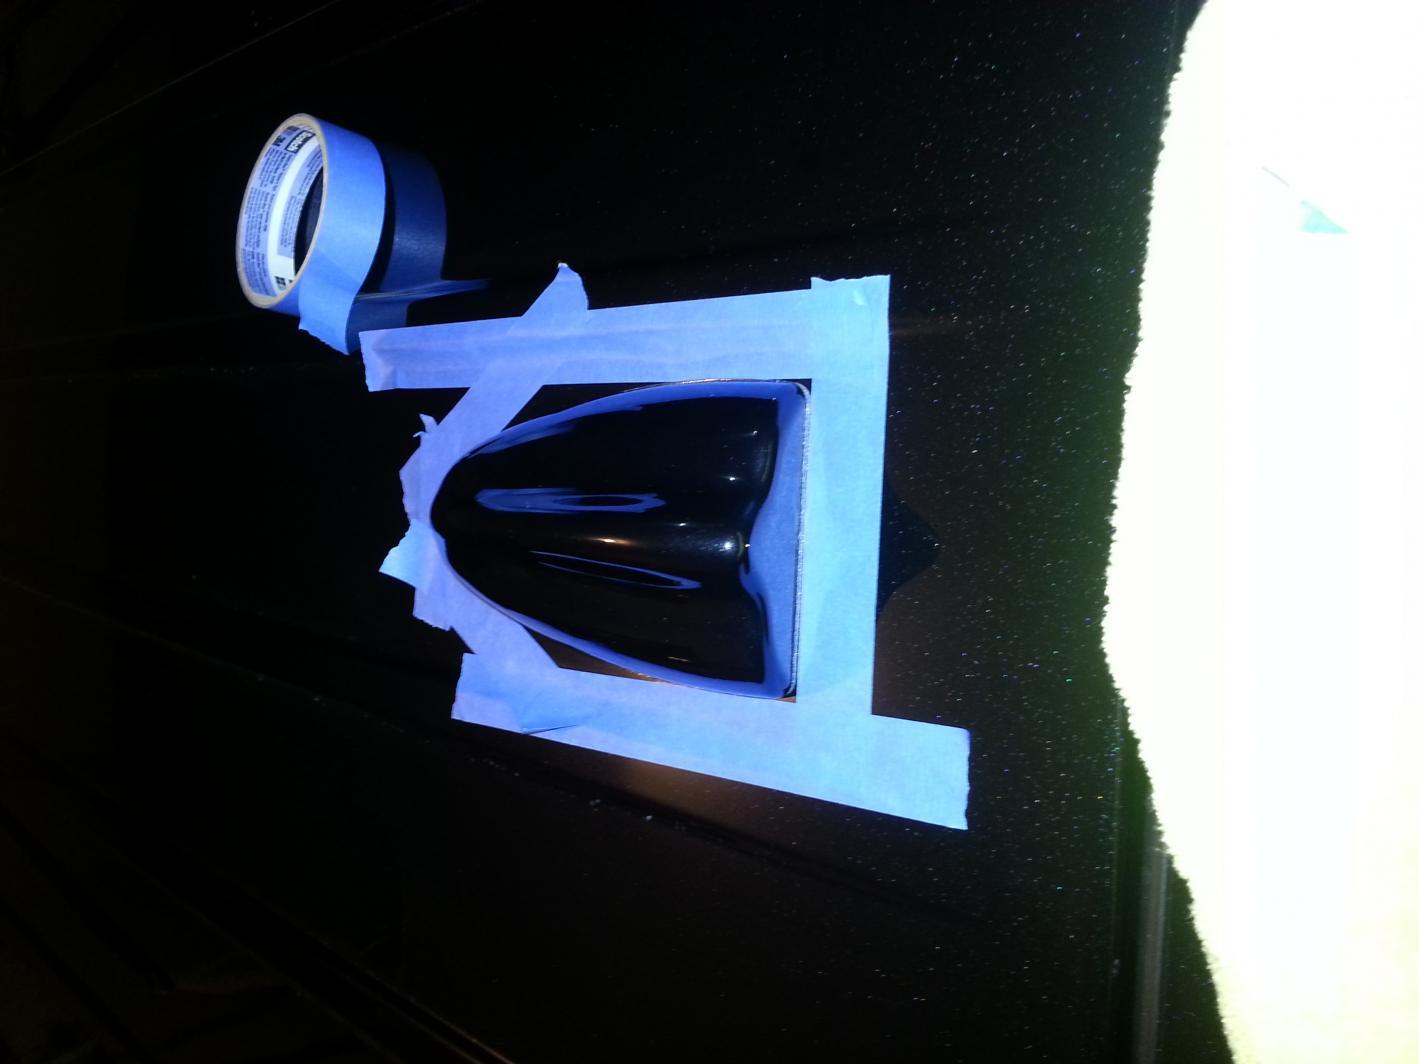 Vg Shark Fin Antenna Installed On 2017 Durango Rt Image Jpg